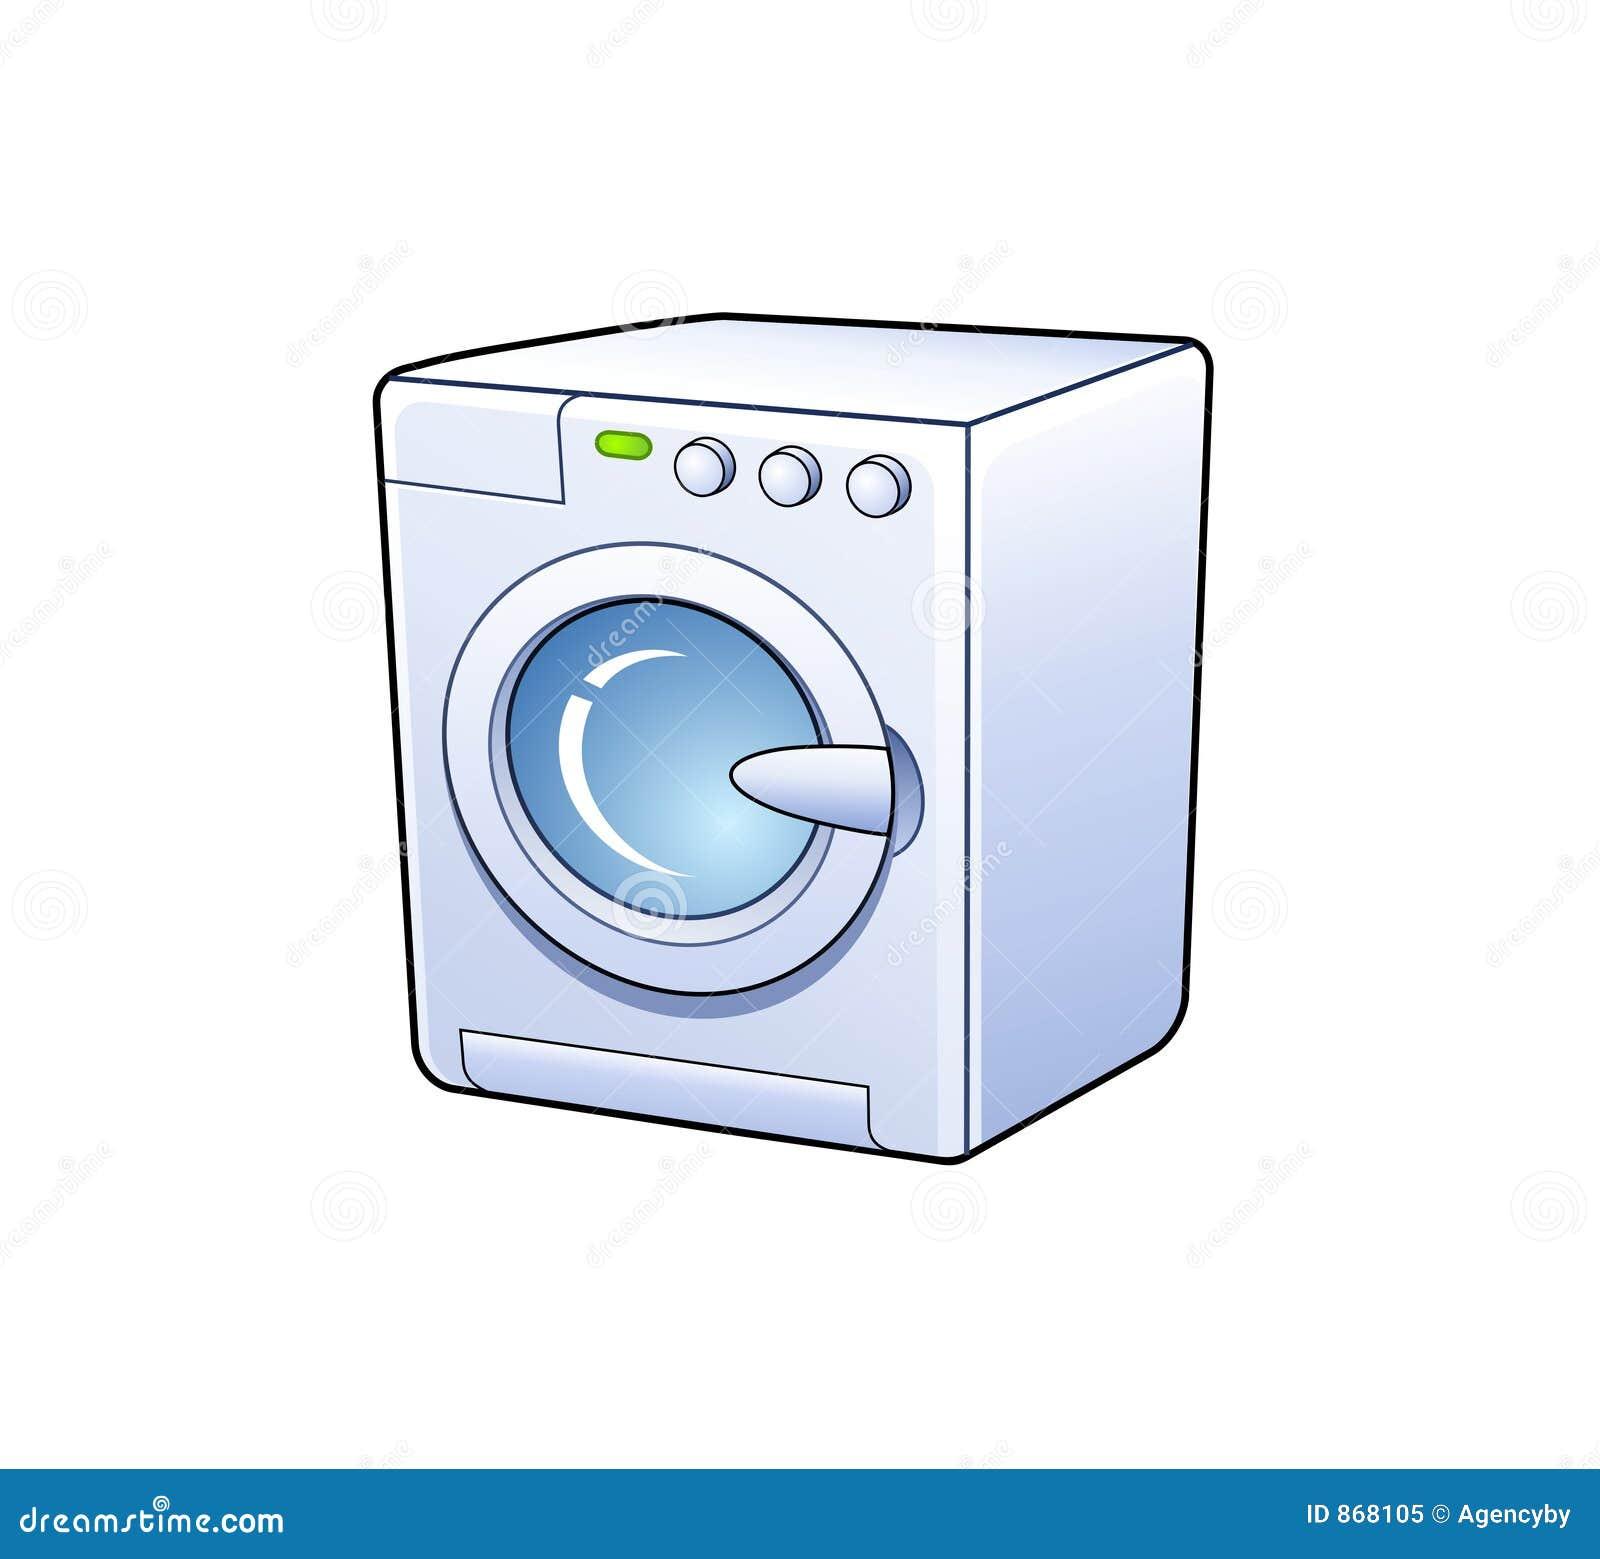 Clip Art Washing Machine ~ Washing machine icon stock vector illustration of metal